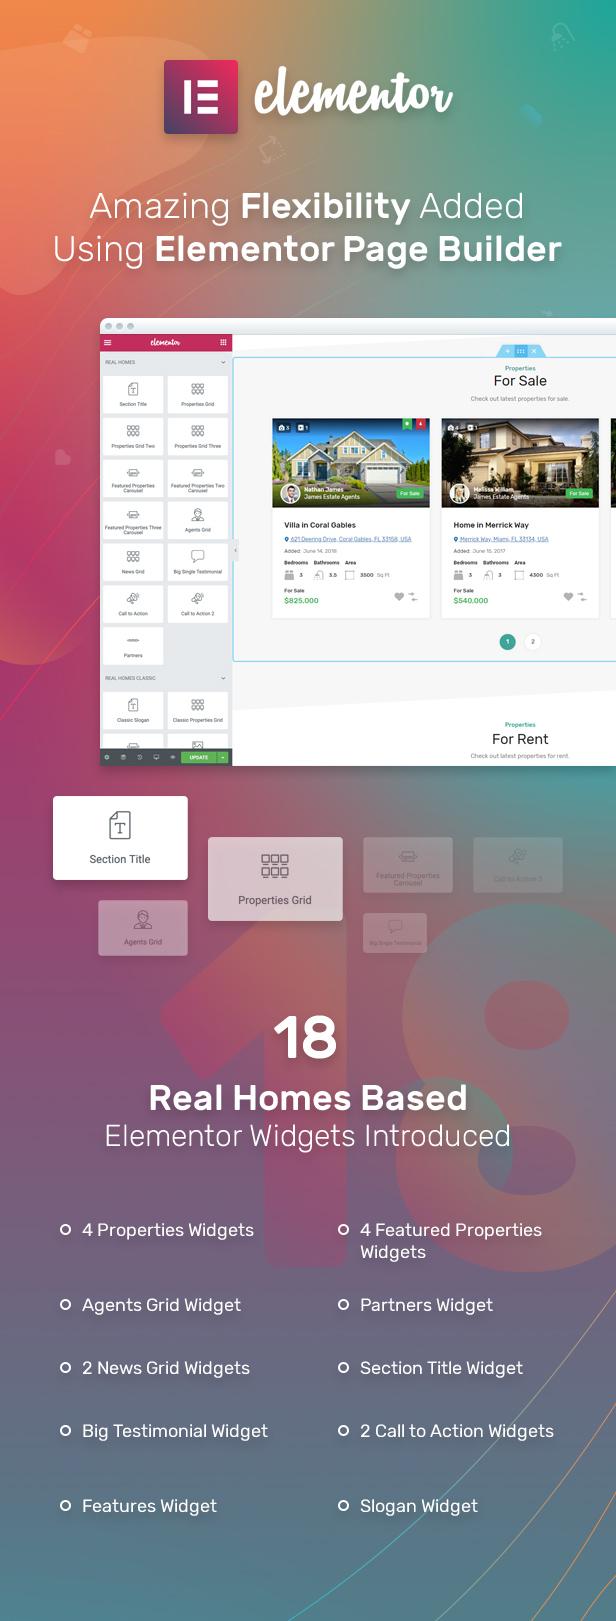 Elementor Page Builder Support